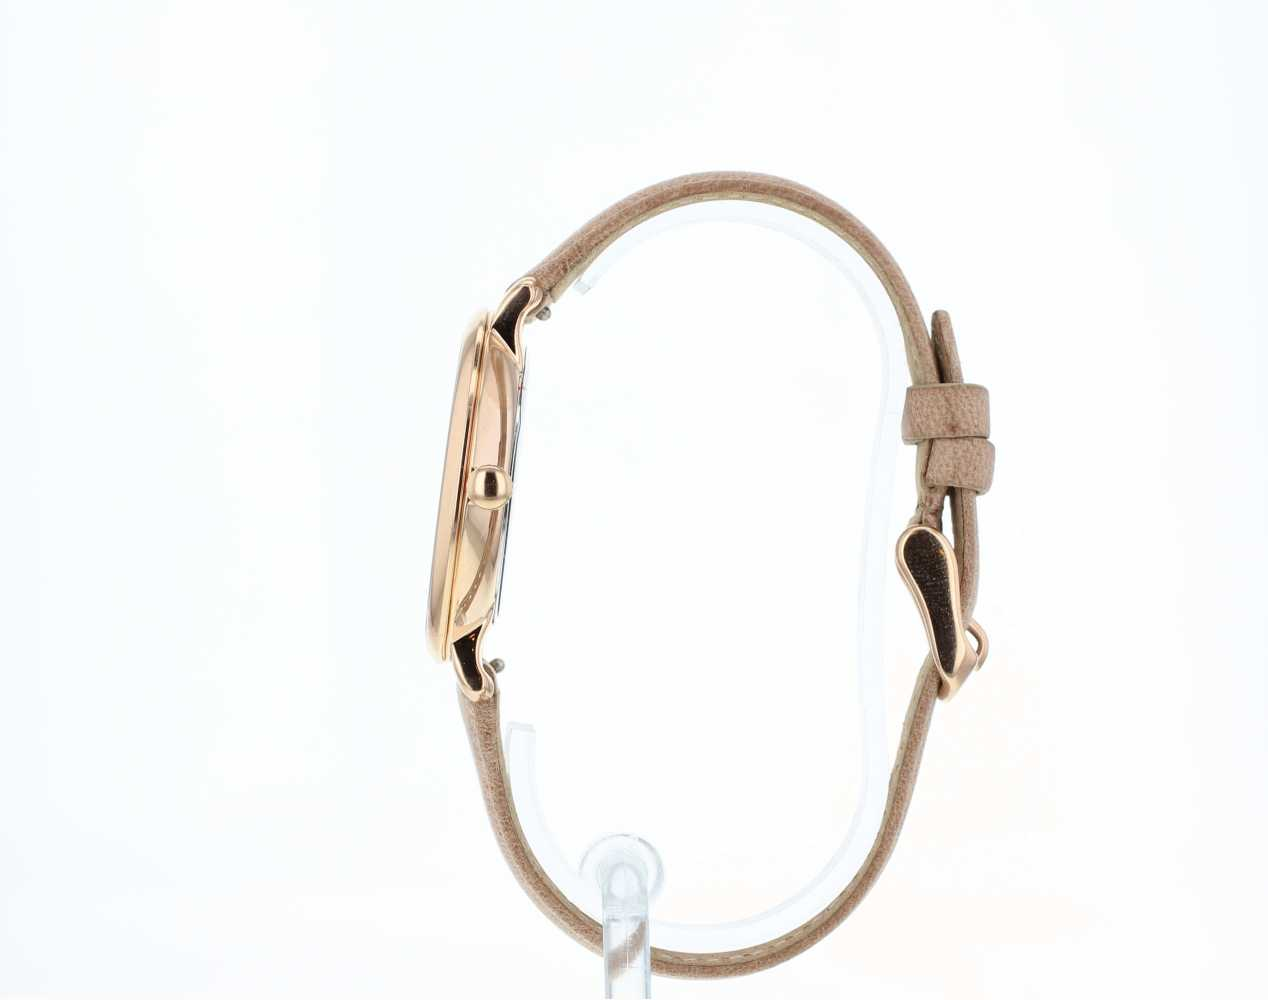 Aus Price Bracelet Diamond Charm 2018 Sleep When Tired